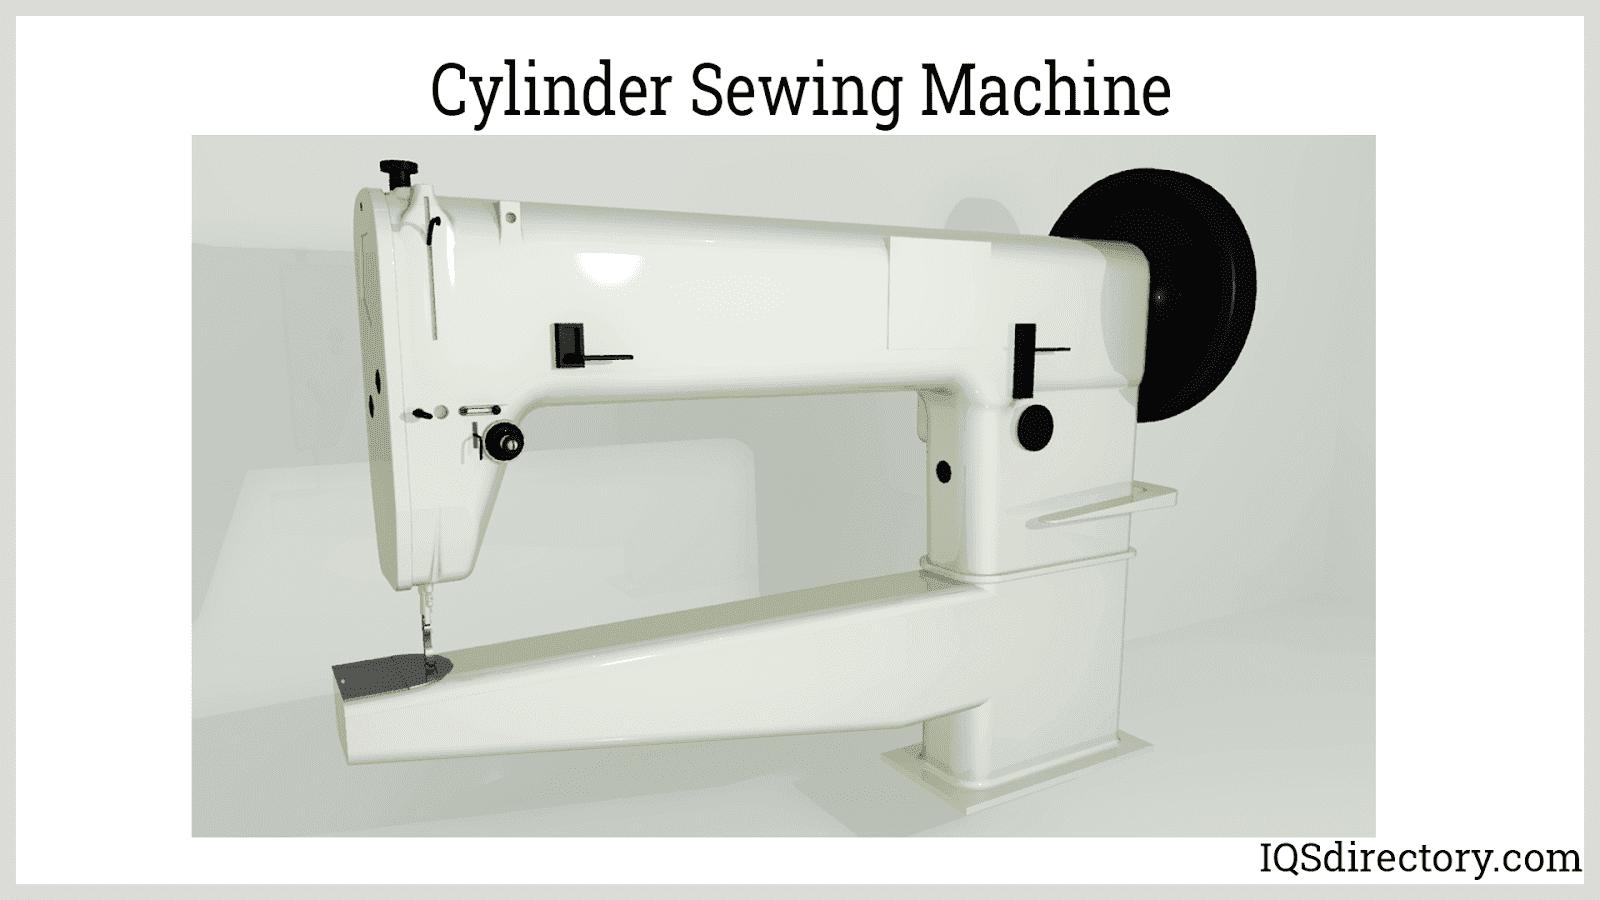 Cylinder Sewing Machine